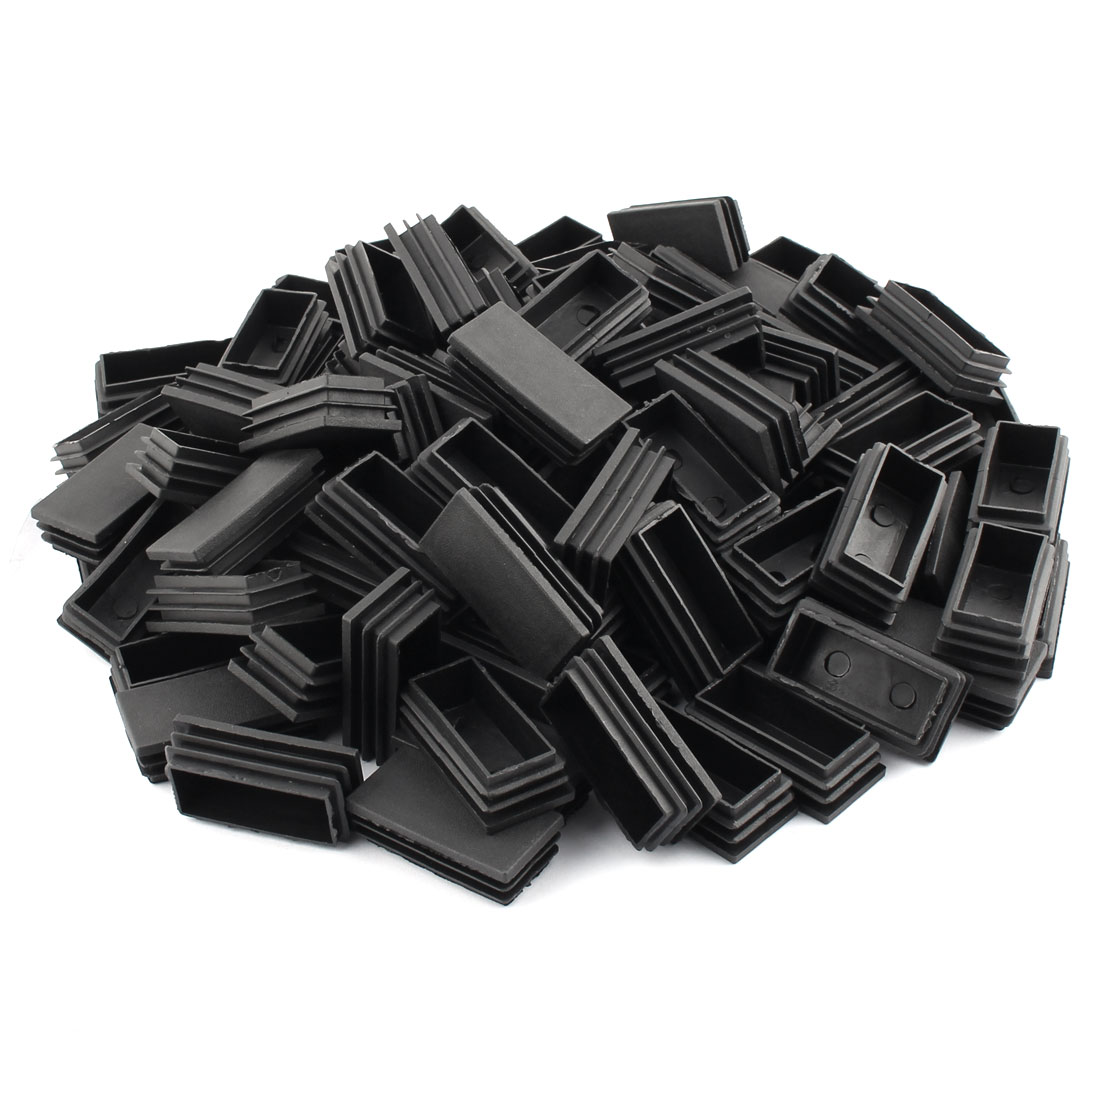 Home Office Plastic Rectangle Shaped Table Chair Legs Tube Insert Black 59 x 30mm 100 Pcs